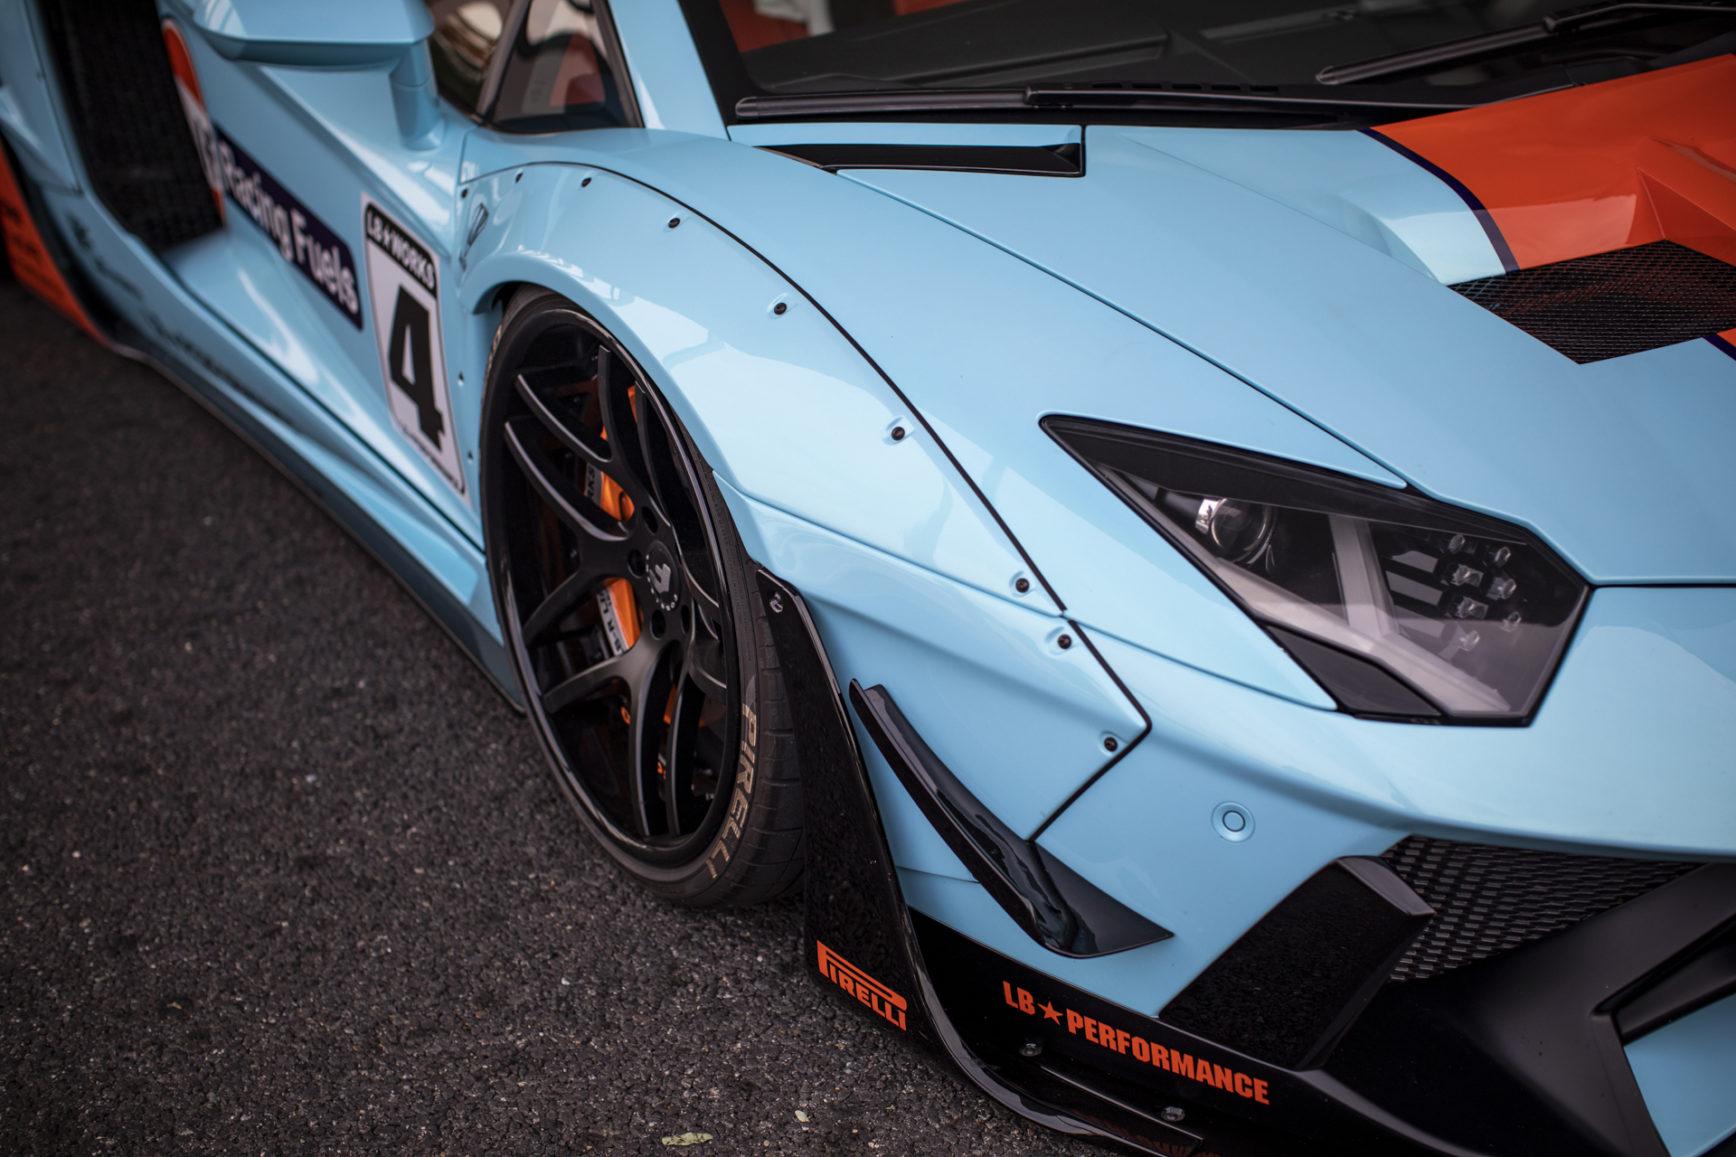 Liberty-Walk-Lamborghini-Aventador-Gulf-Livery-2018-front-light